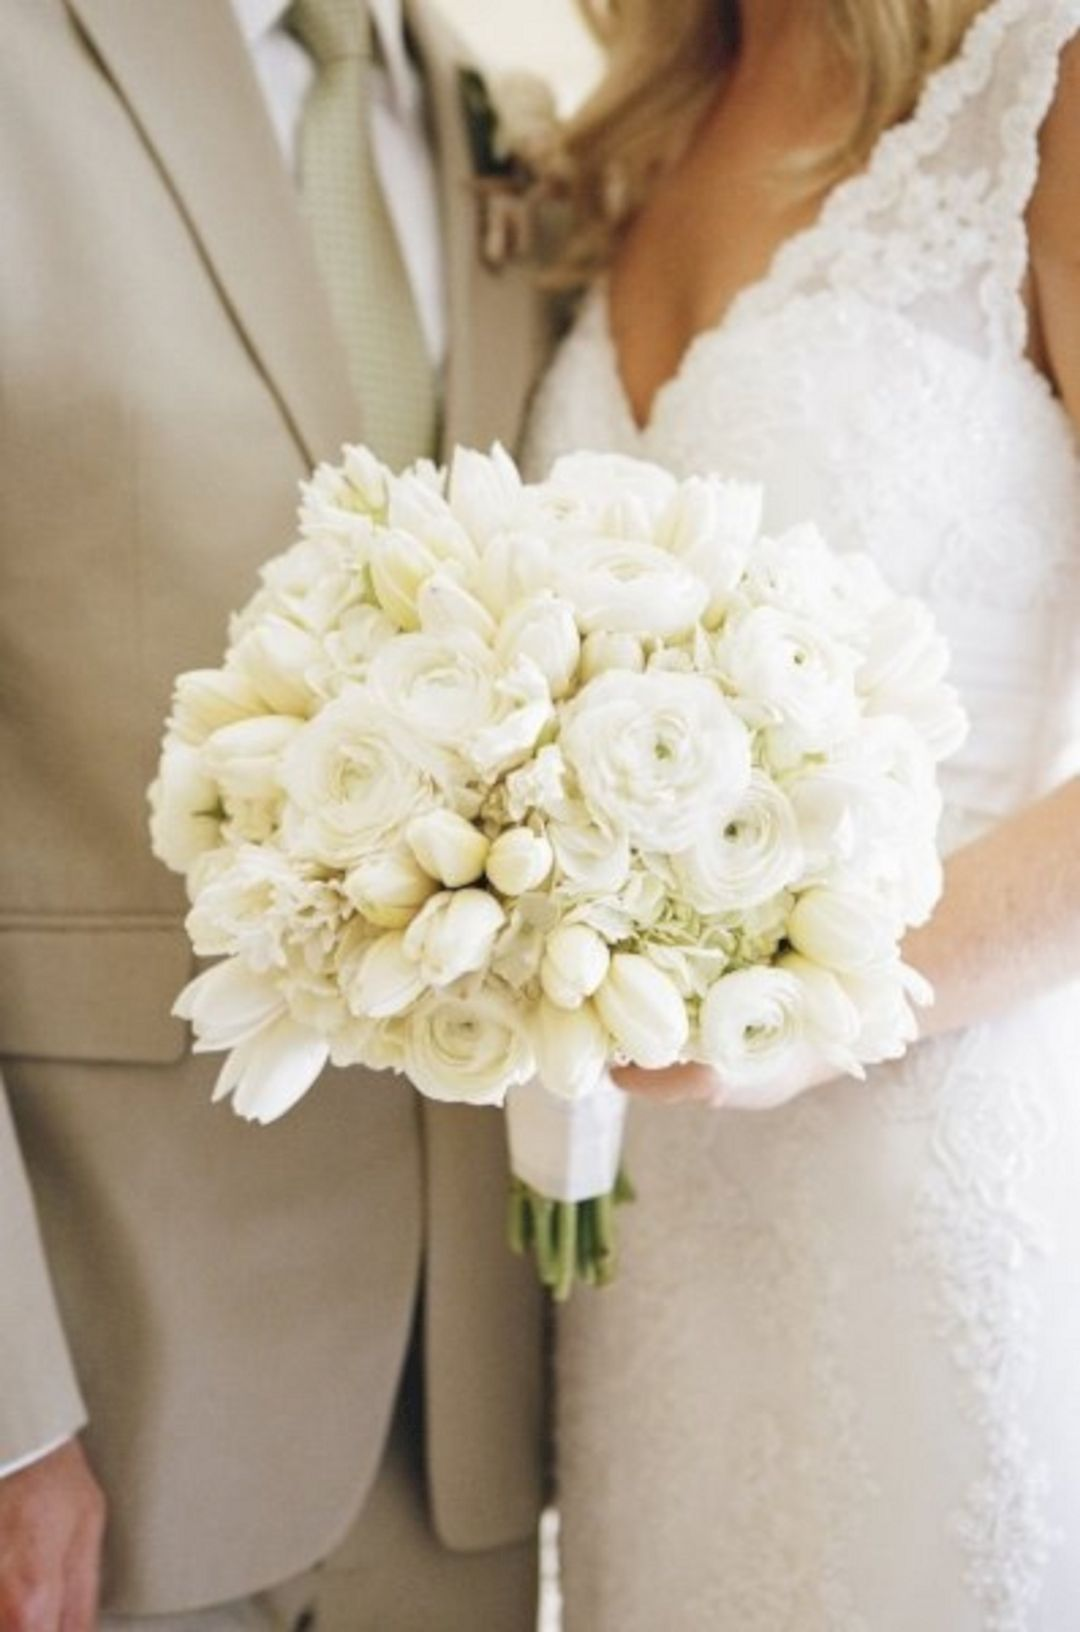 43+ Tulip wedding bouquet meaning ideas in 2021